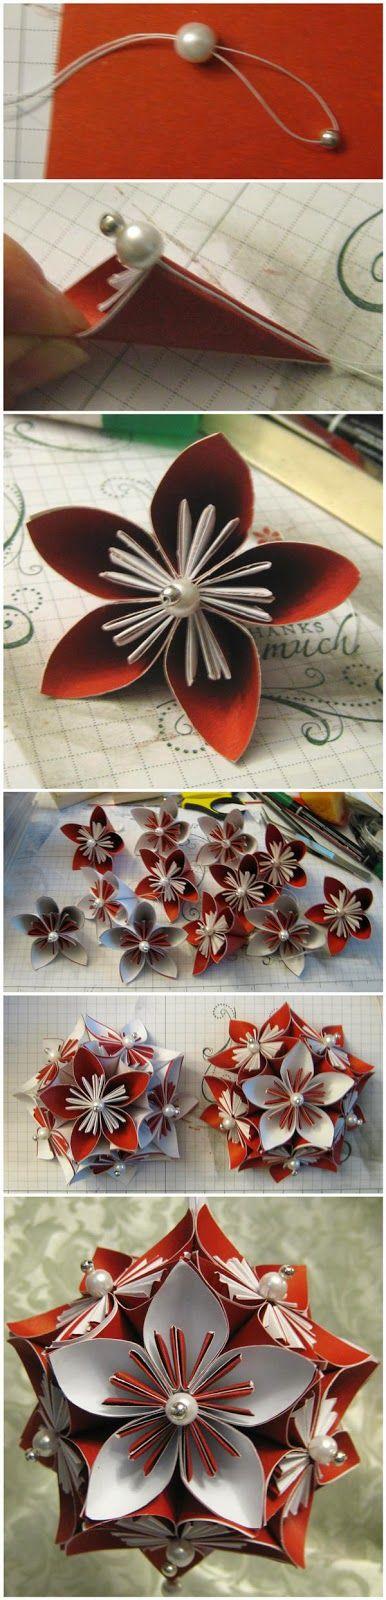 joybobo: Kusudama Flower & Ornament